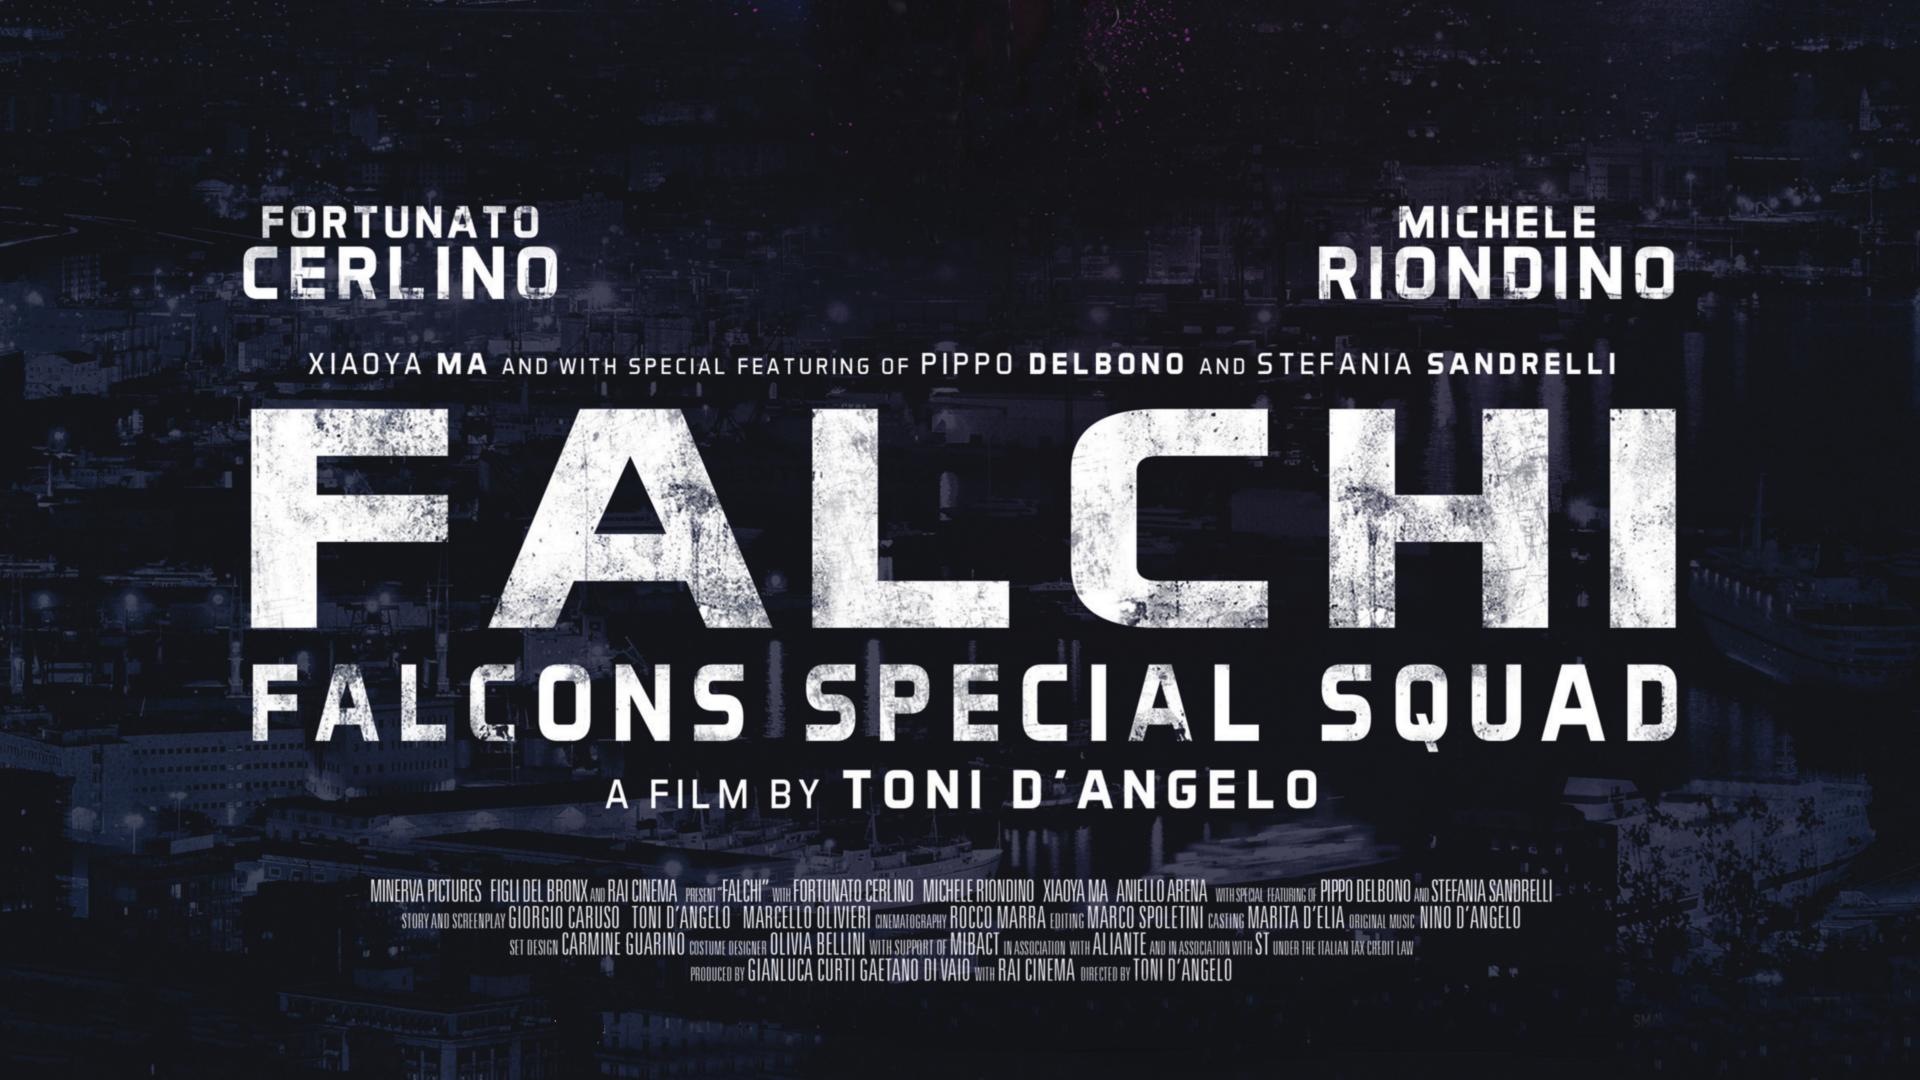 Falcons Special Squad